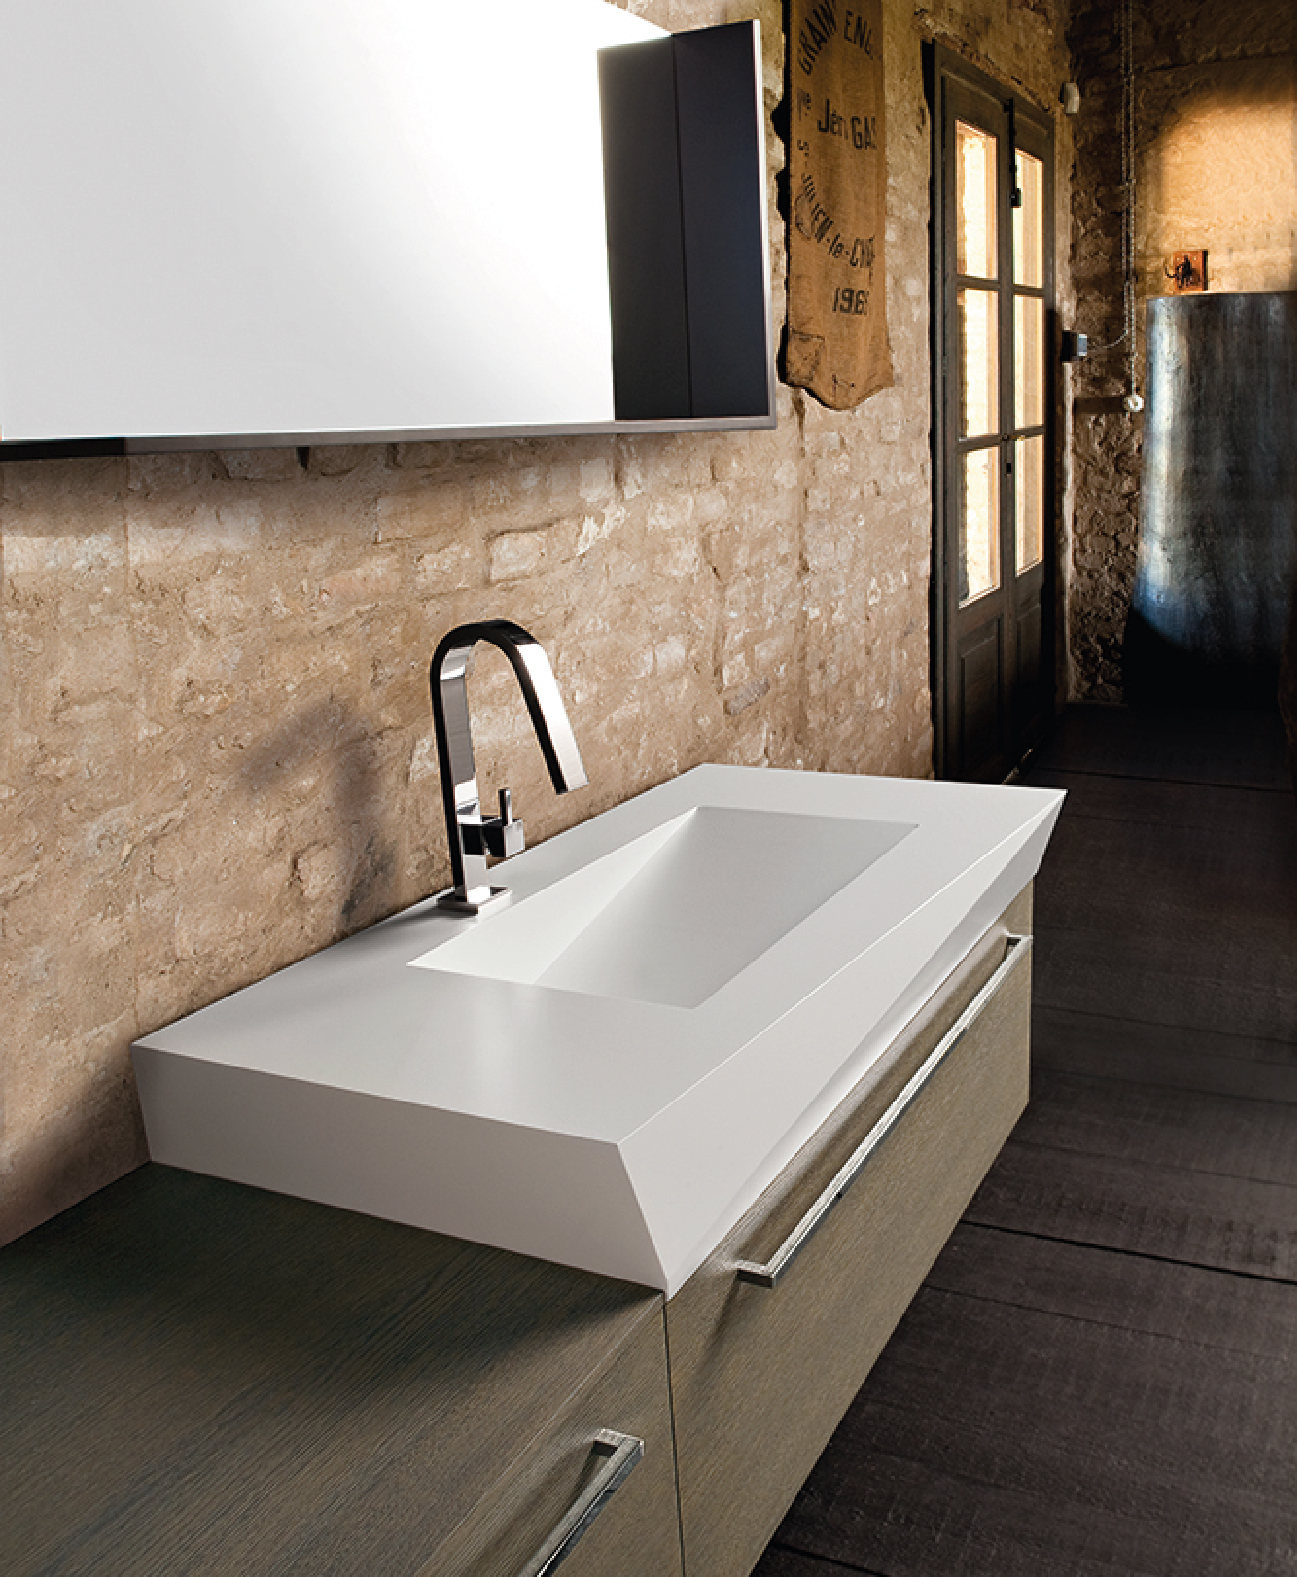 bathrooms-12.jpg